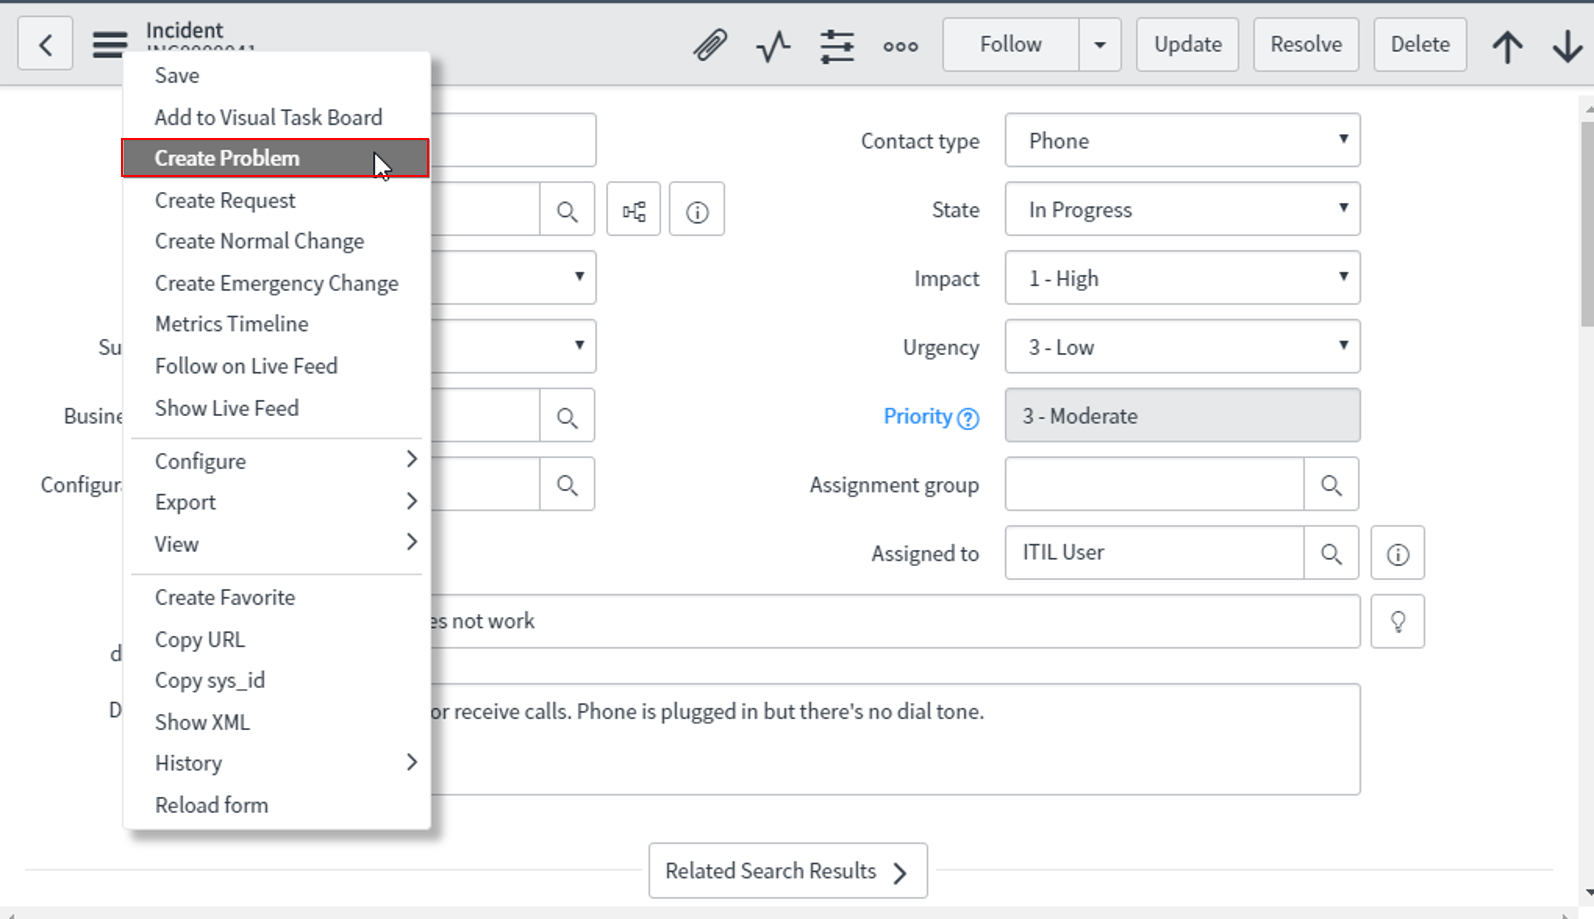 create_problem-Servicenow itsm tools-Edureka